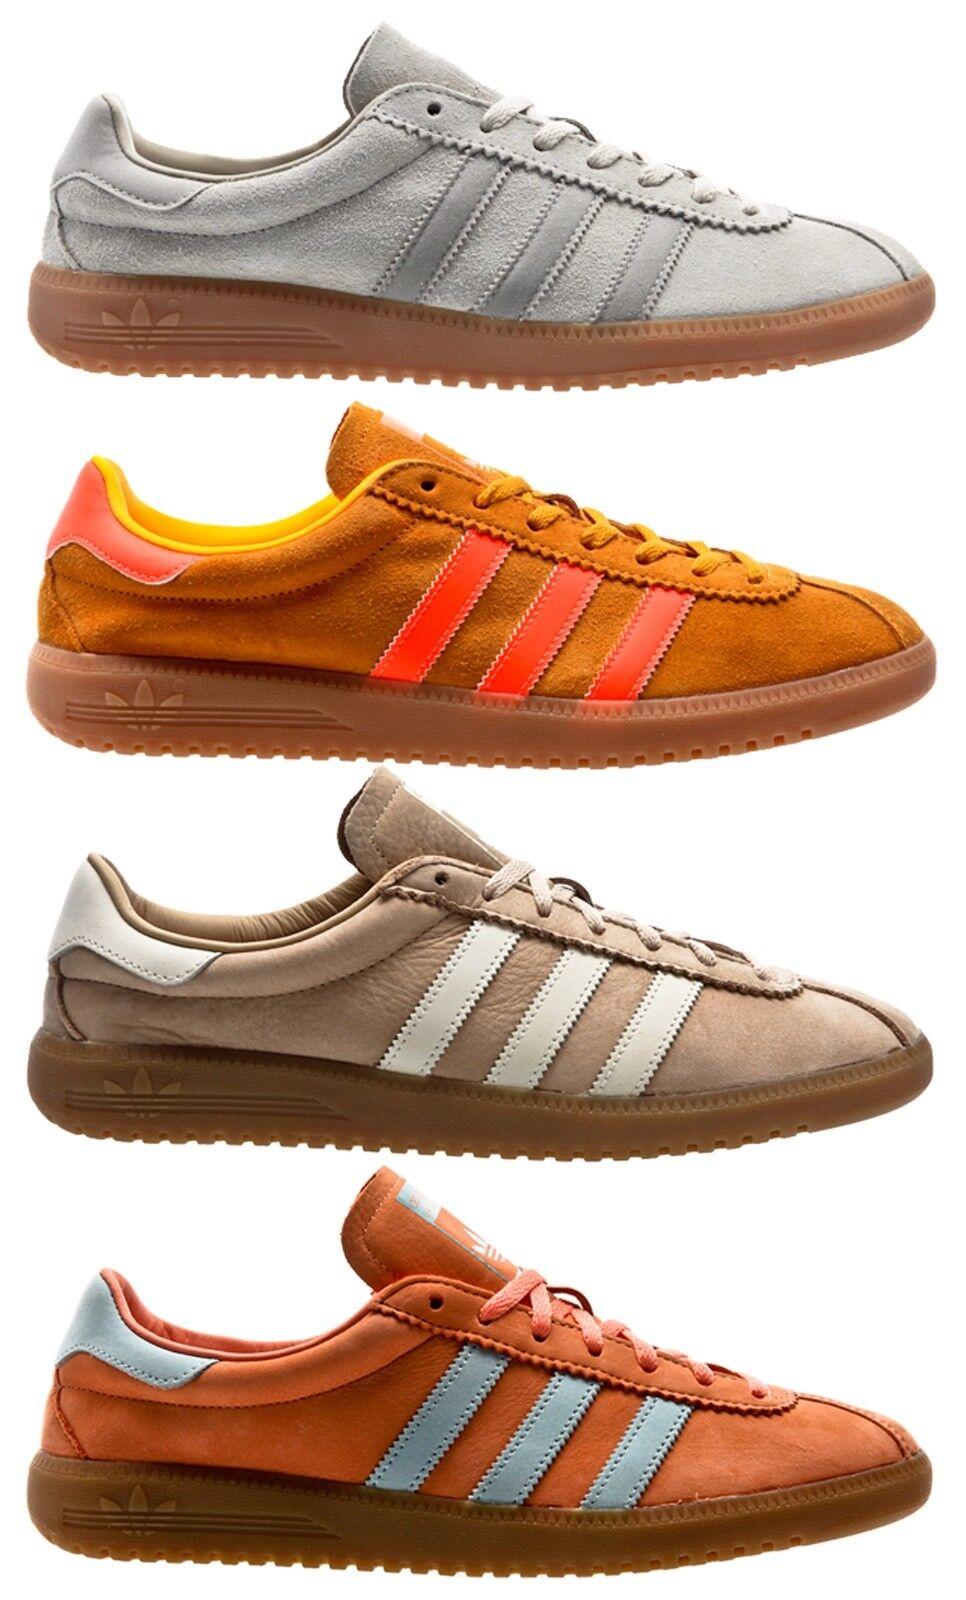 Adidas Originals Bermuda Men Sneaker Mens shoes shoes Trainers